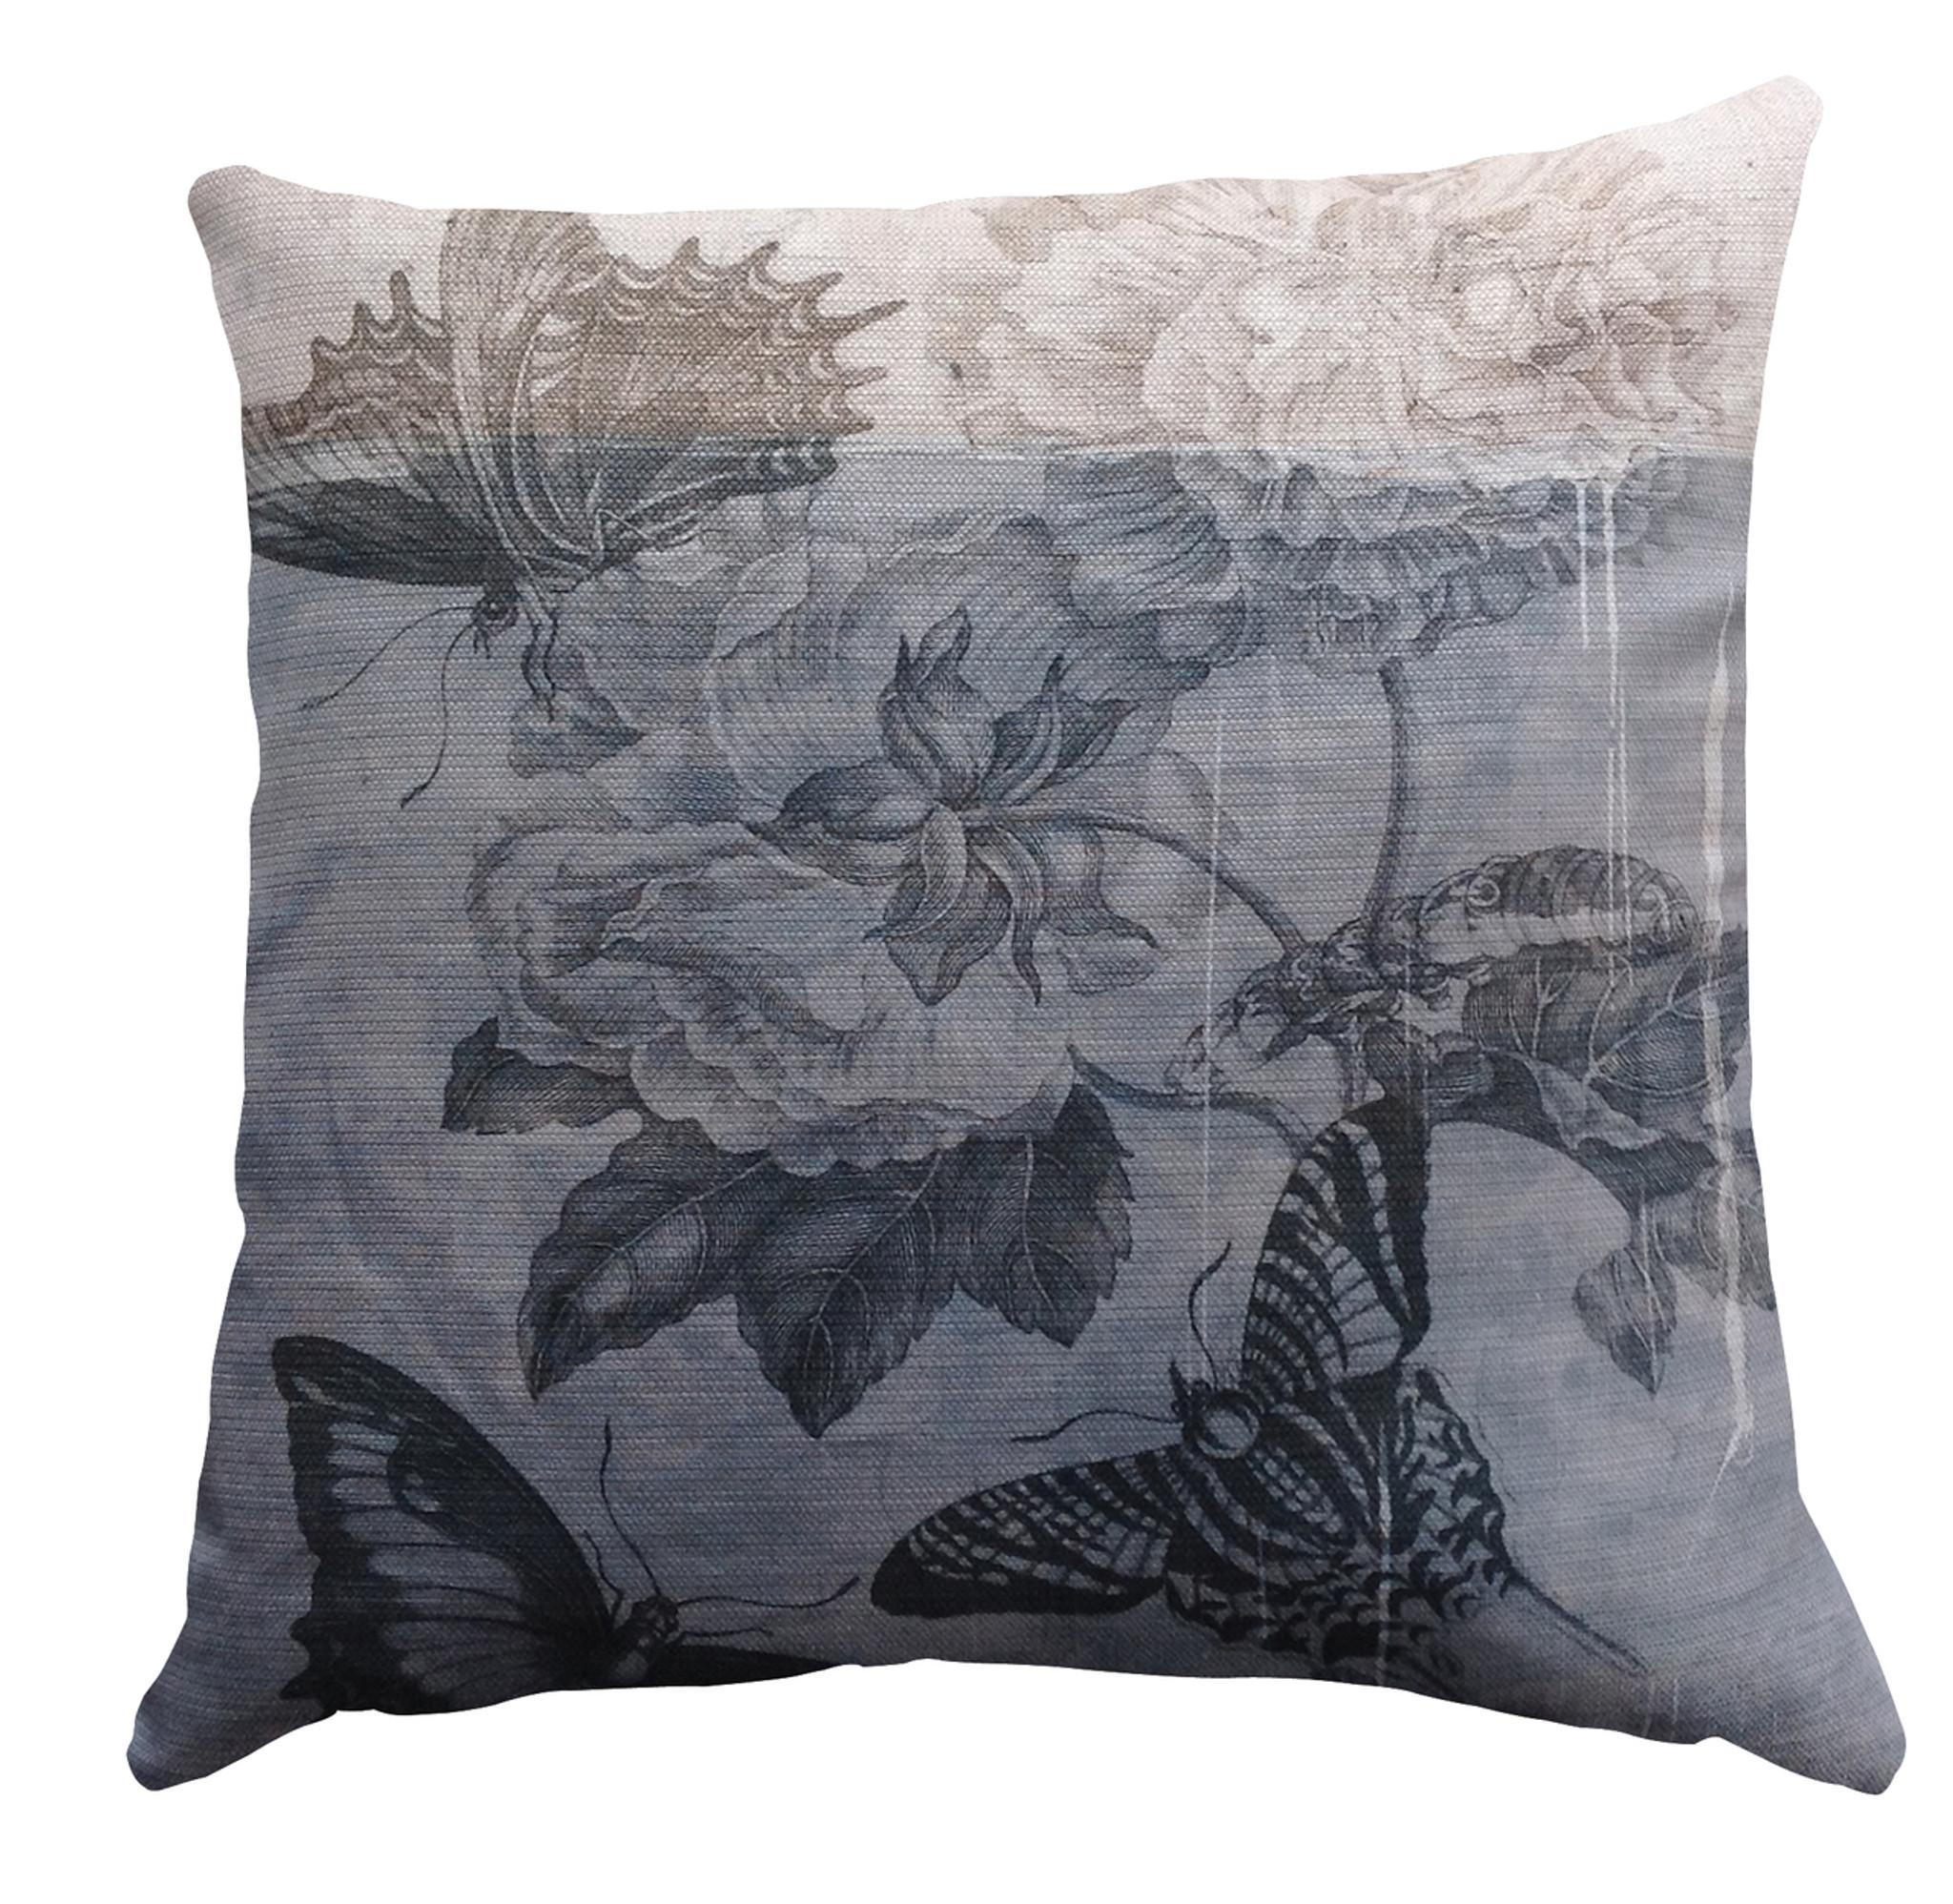 Cushion Cover - Botanical Graffiti - Blue Butterfly Day